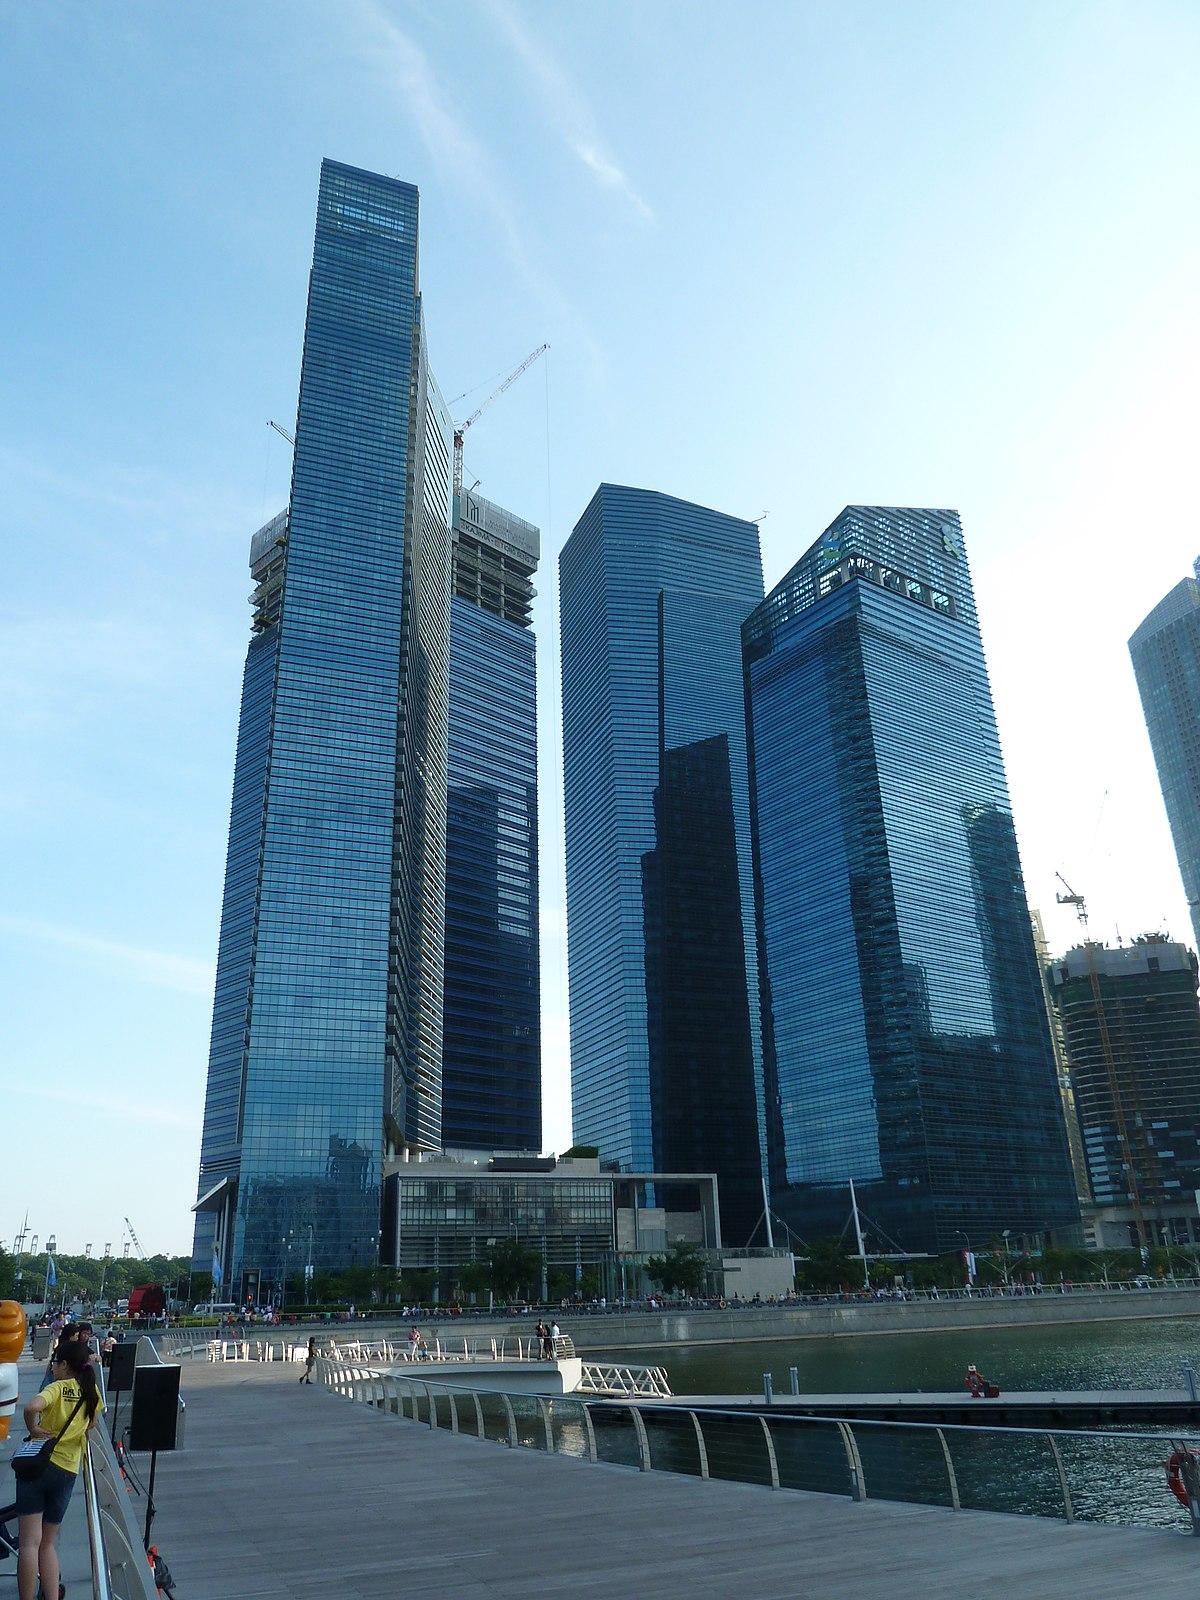 Marina bay financial centre wikipedia la enciclopedia libre - Abreviatura de arquitecto ...